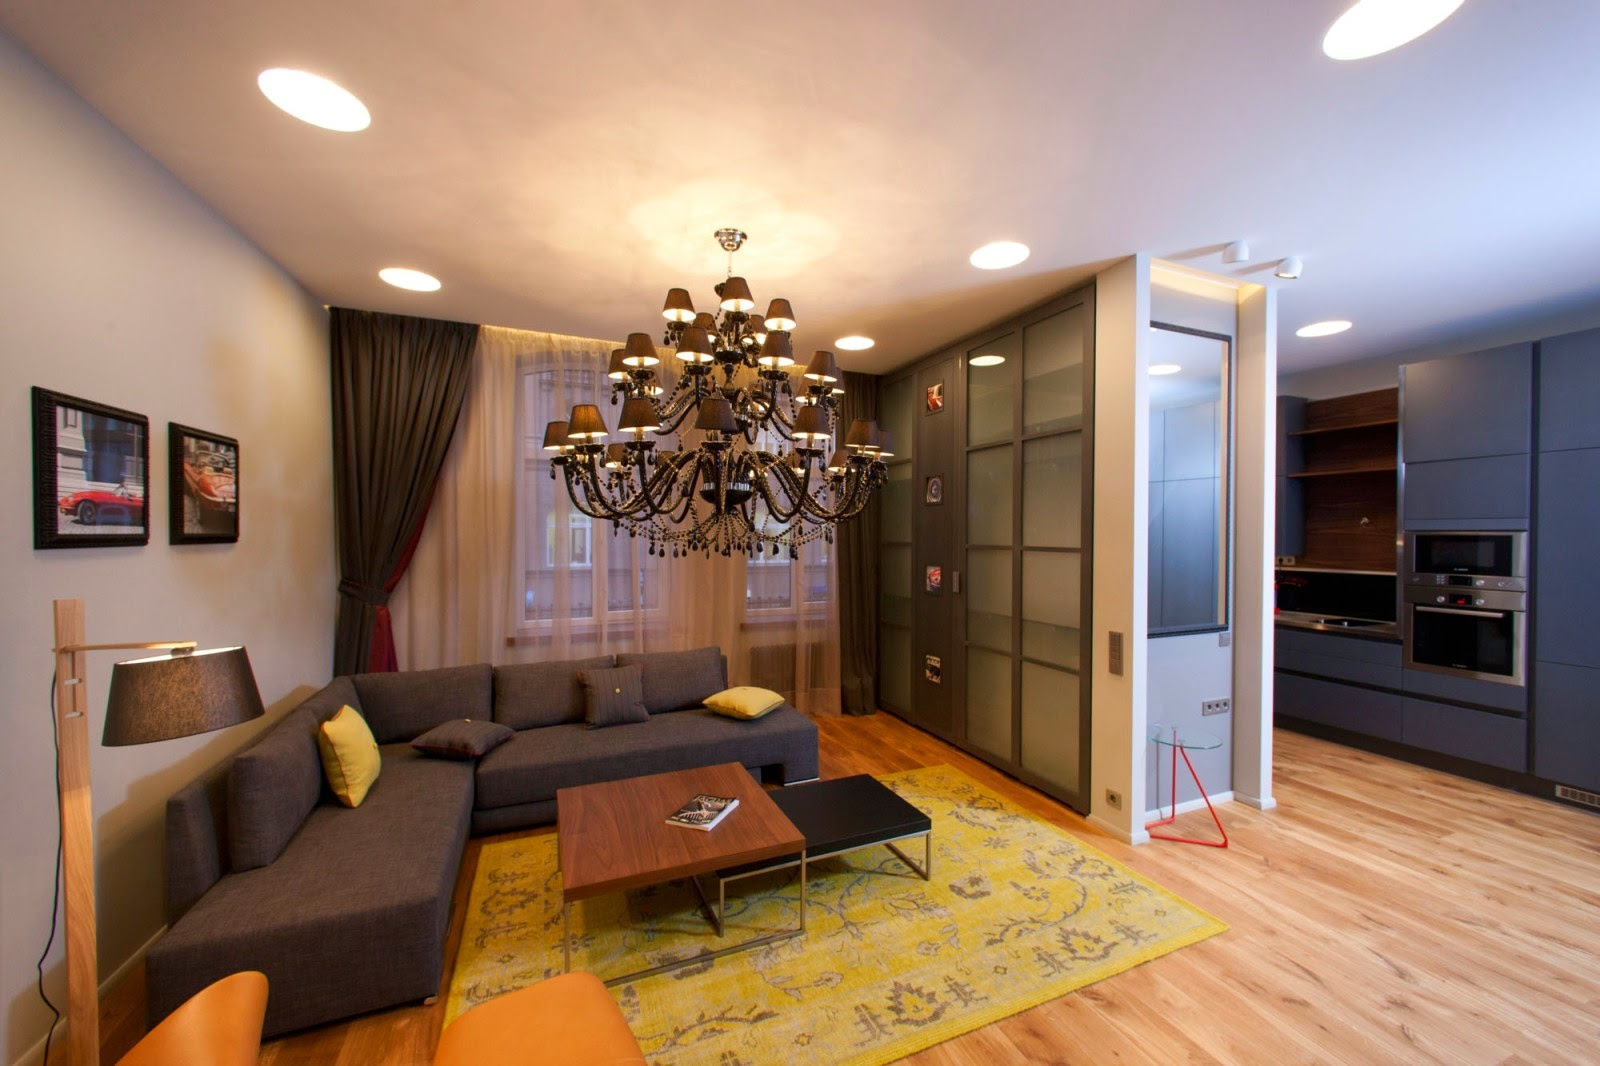 Квартиры студии эконом класс дизайн